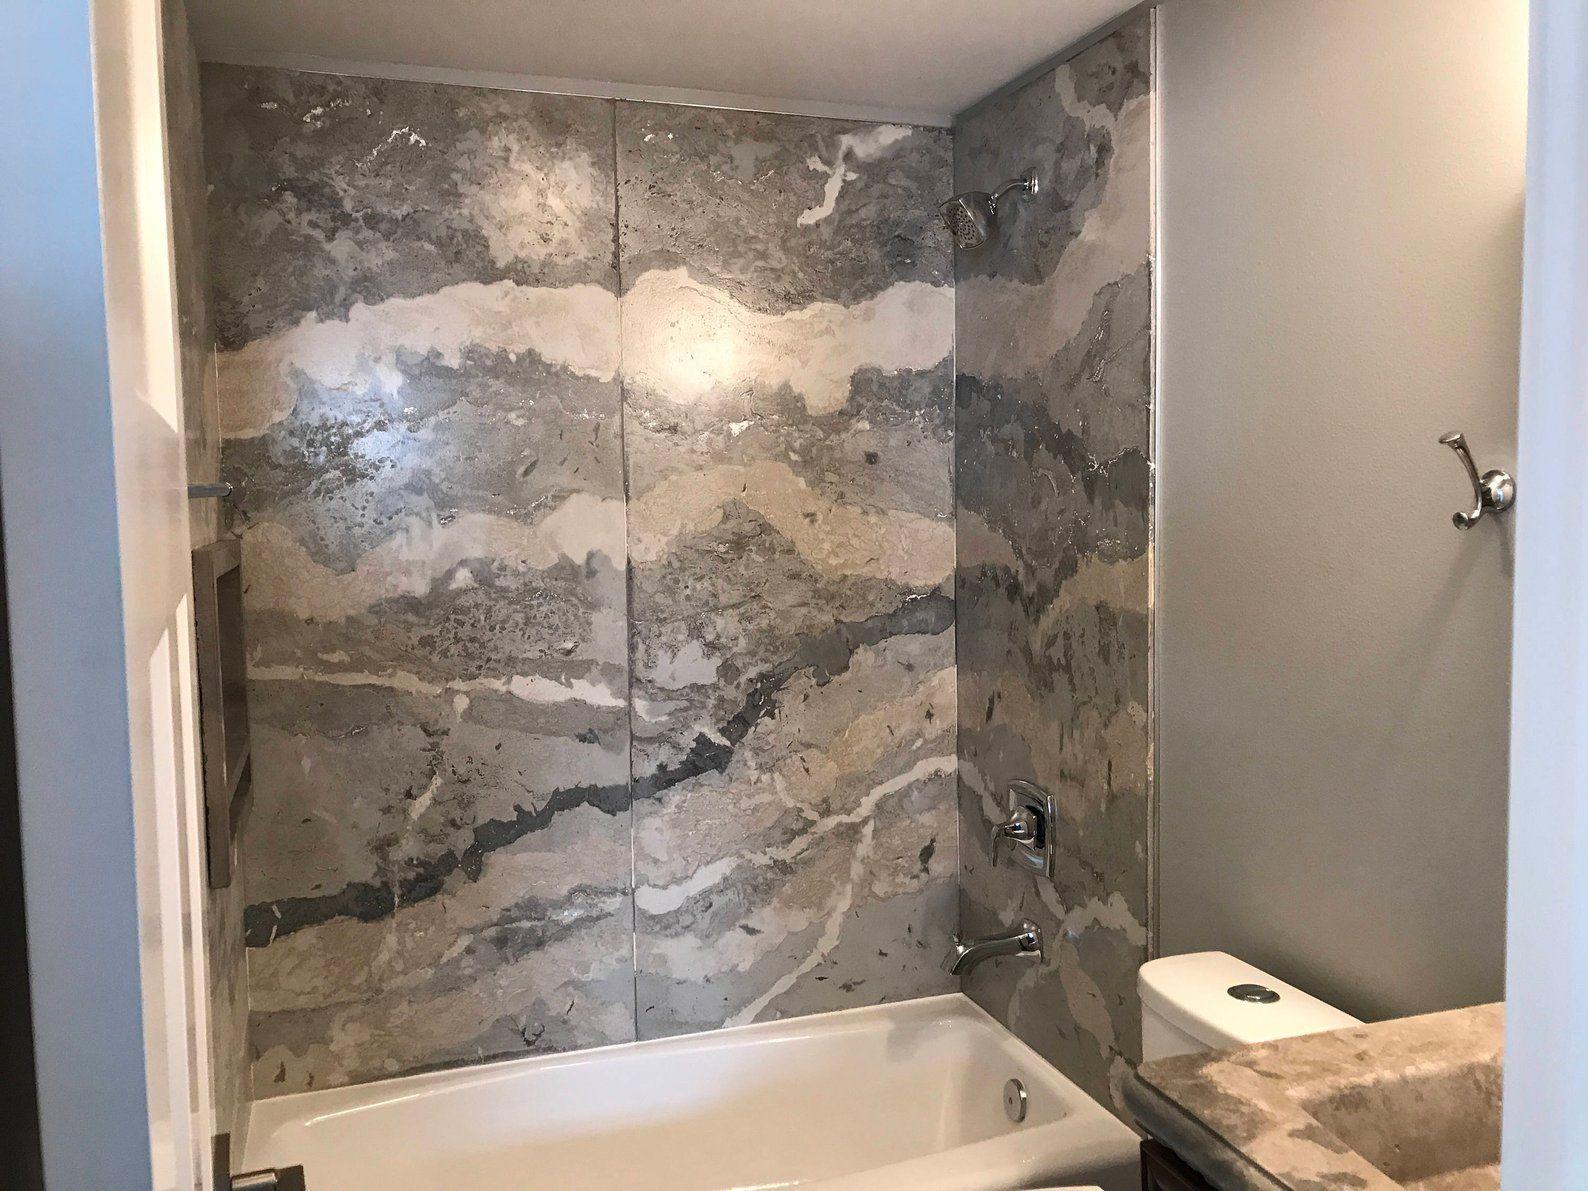 Concrete Shower Surround 1 2 Panels Free Shipping Etsy Concrete Shower Shower Surround Shower Panels